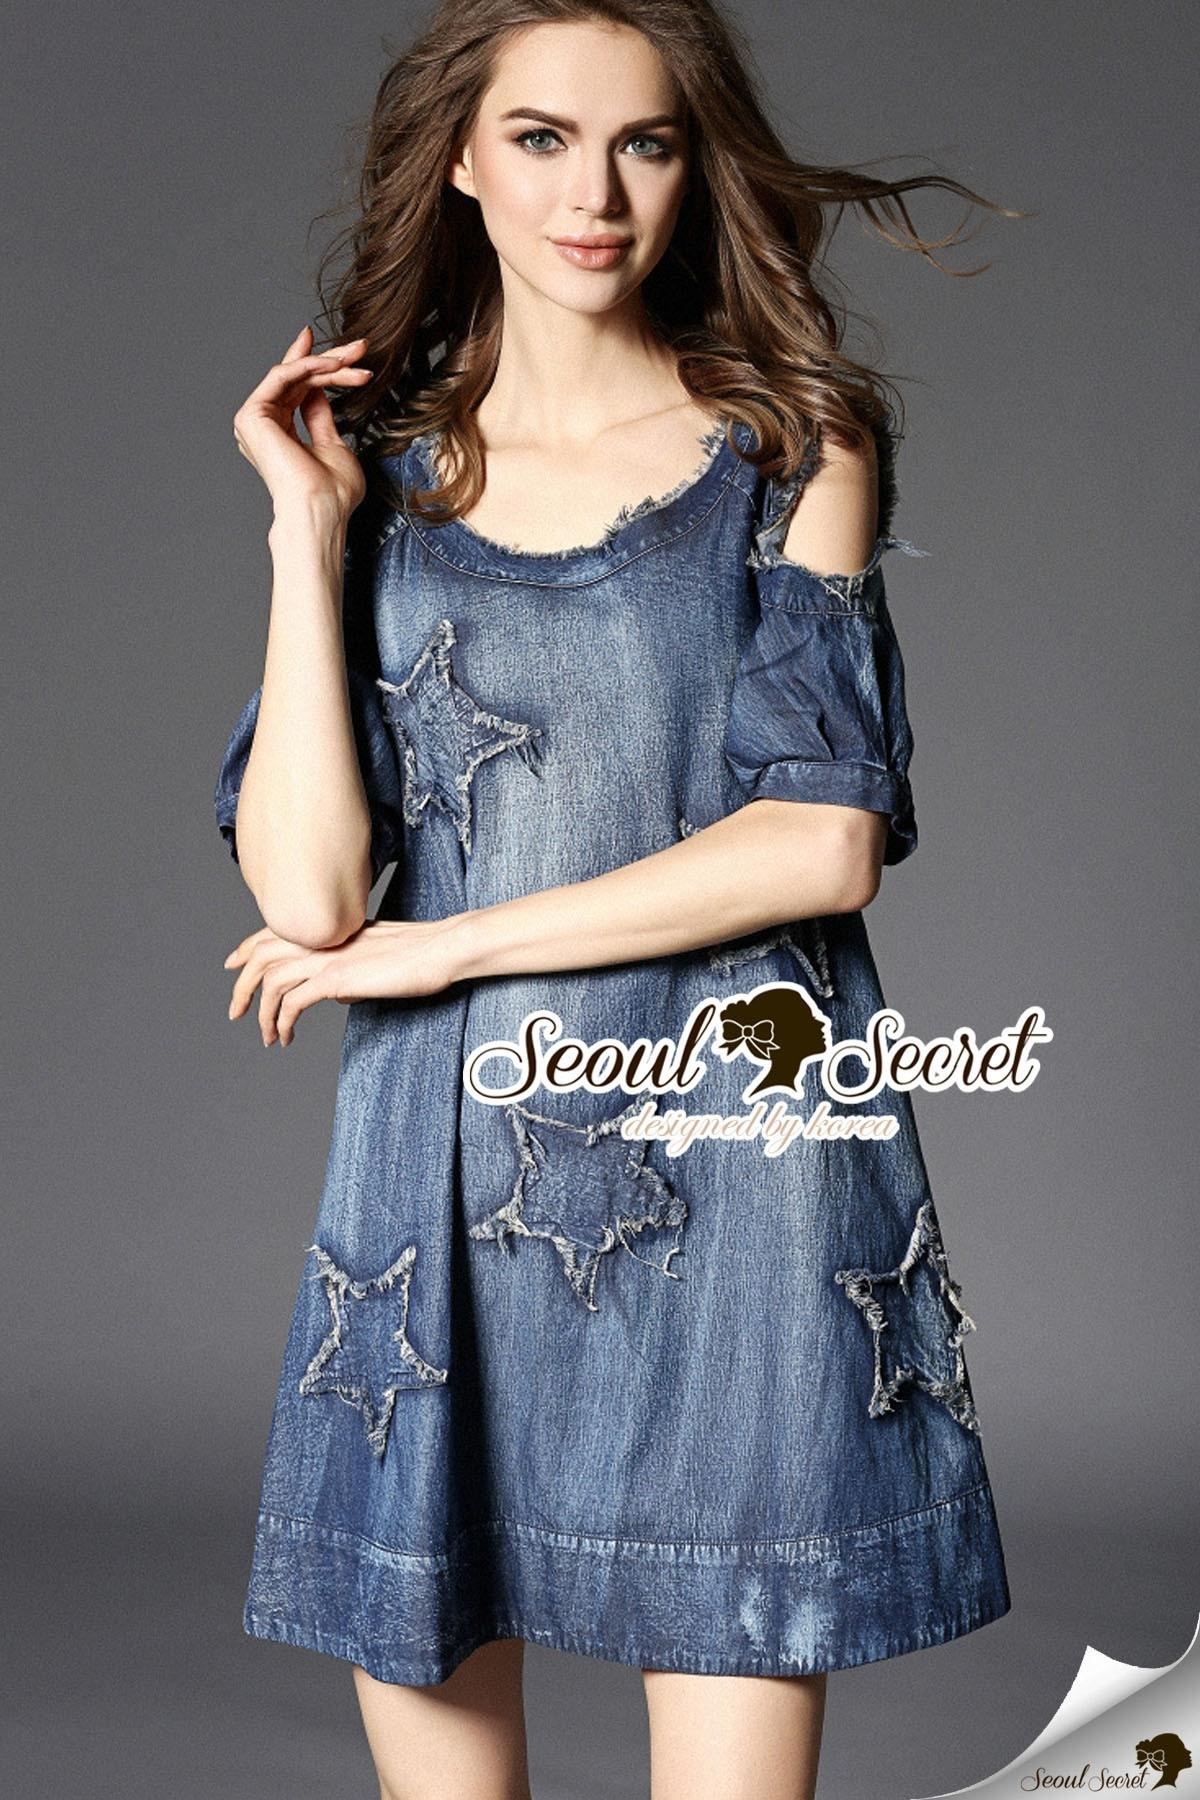 Seoul Secret Say's... Nifty Star Open Shoulder Denim Dress